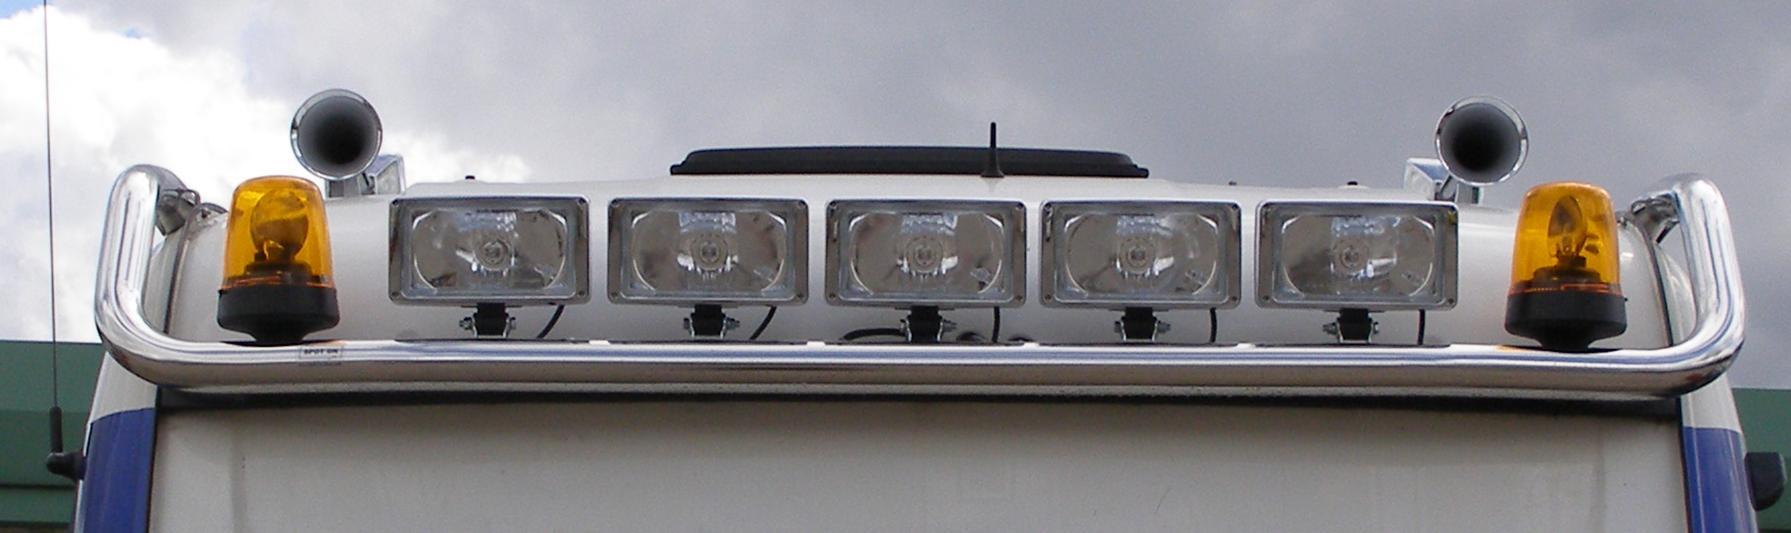 Hella 220 lights wiring diagram